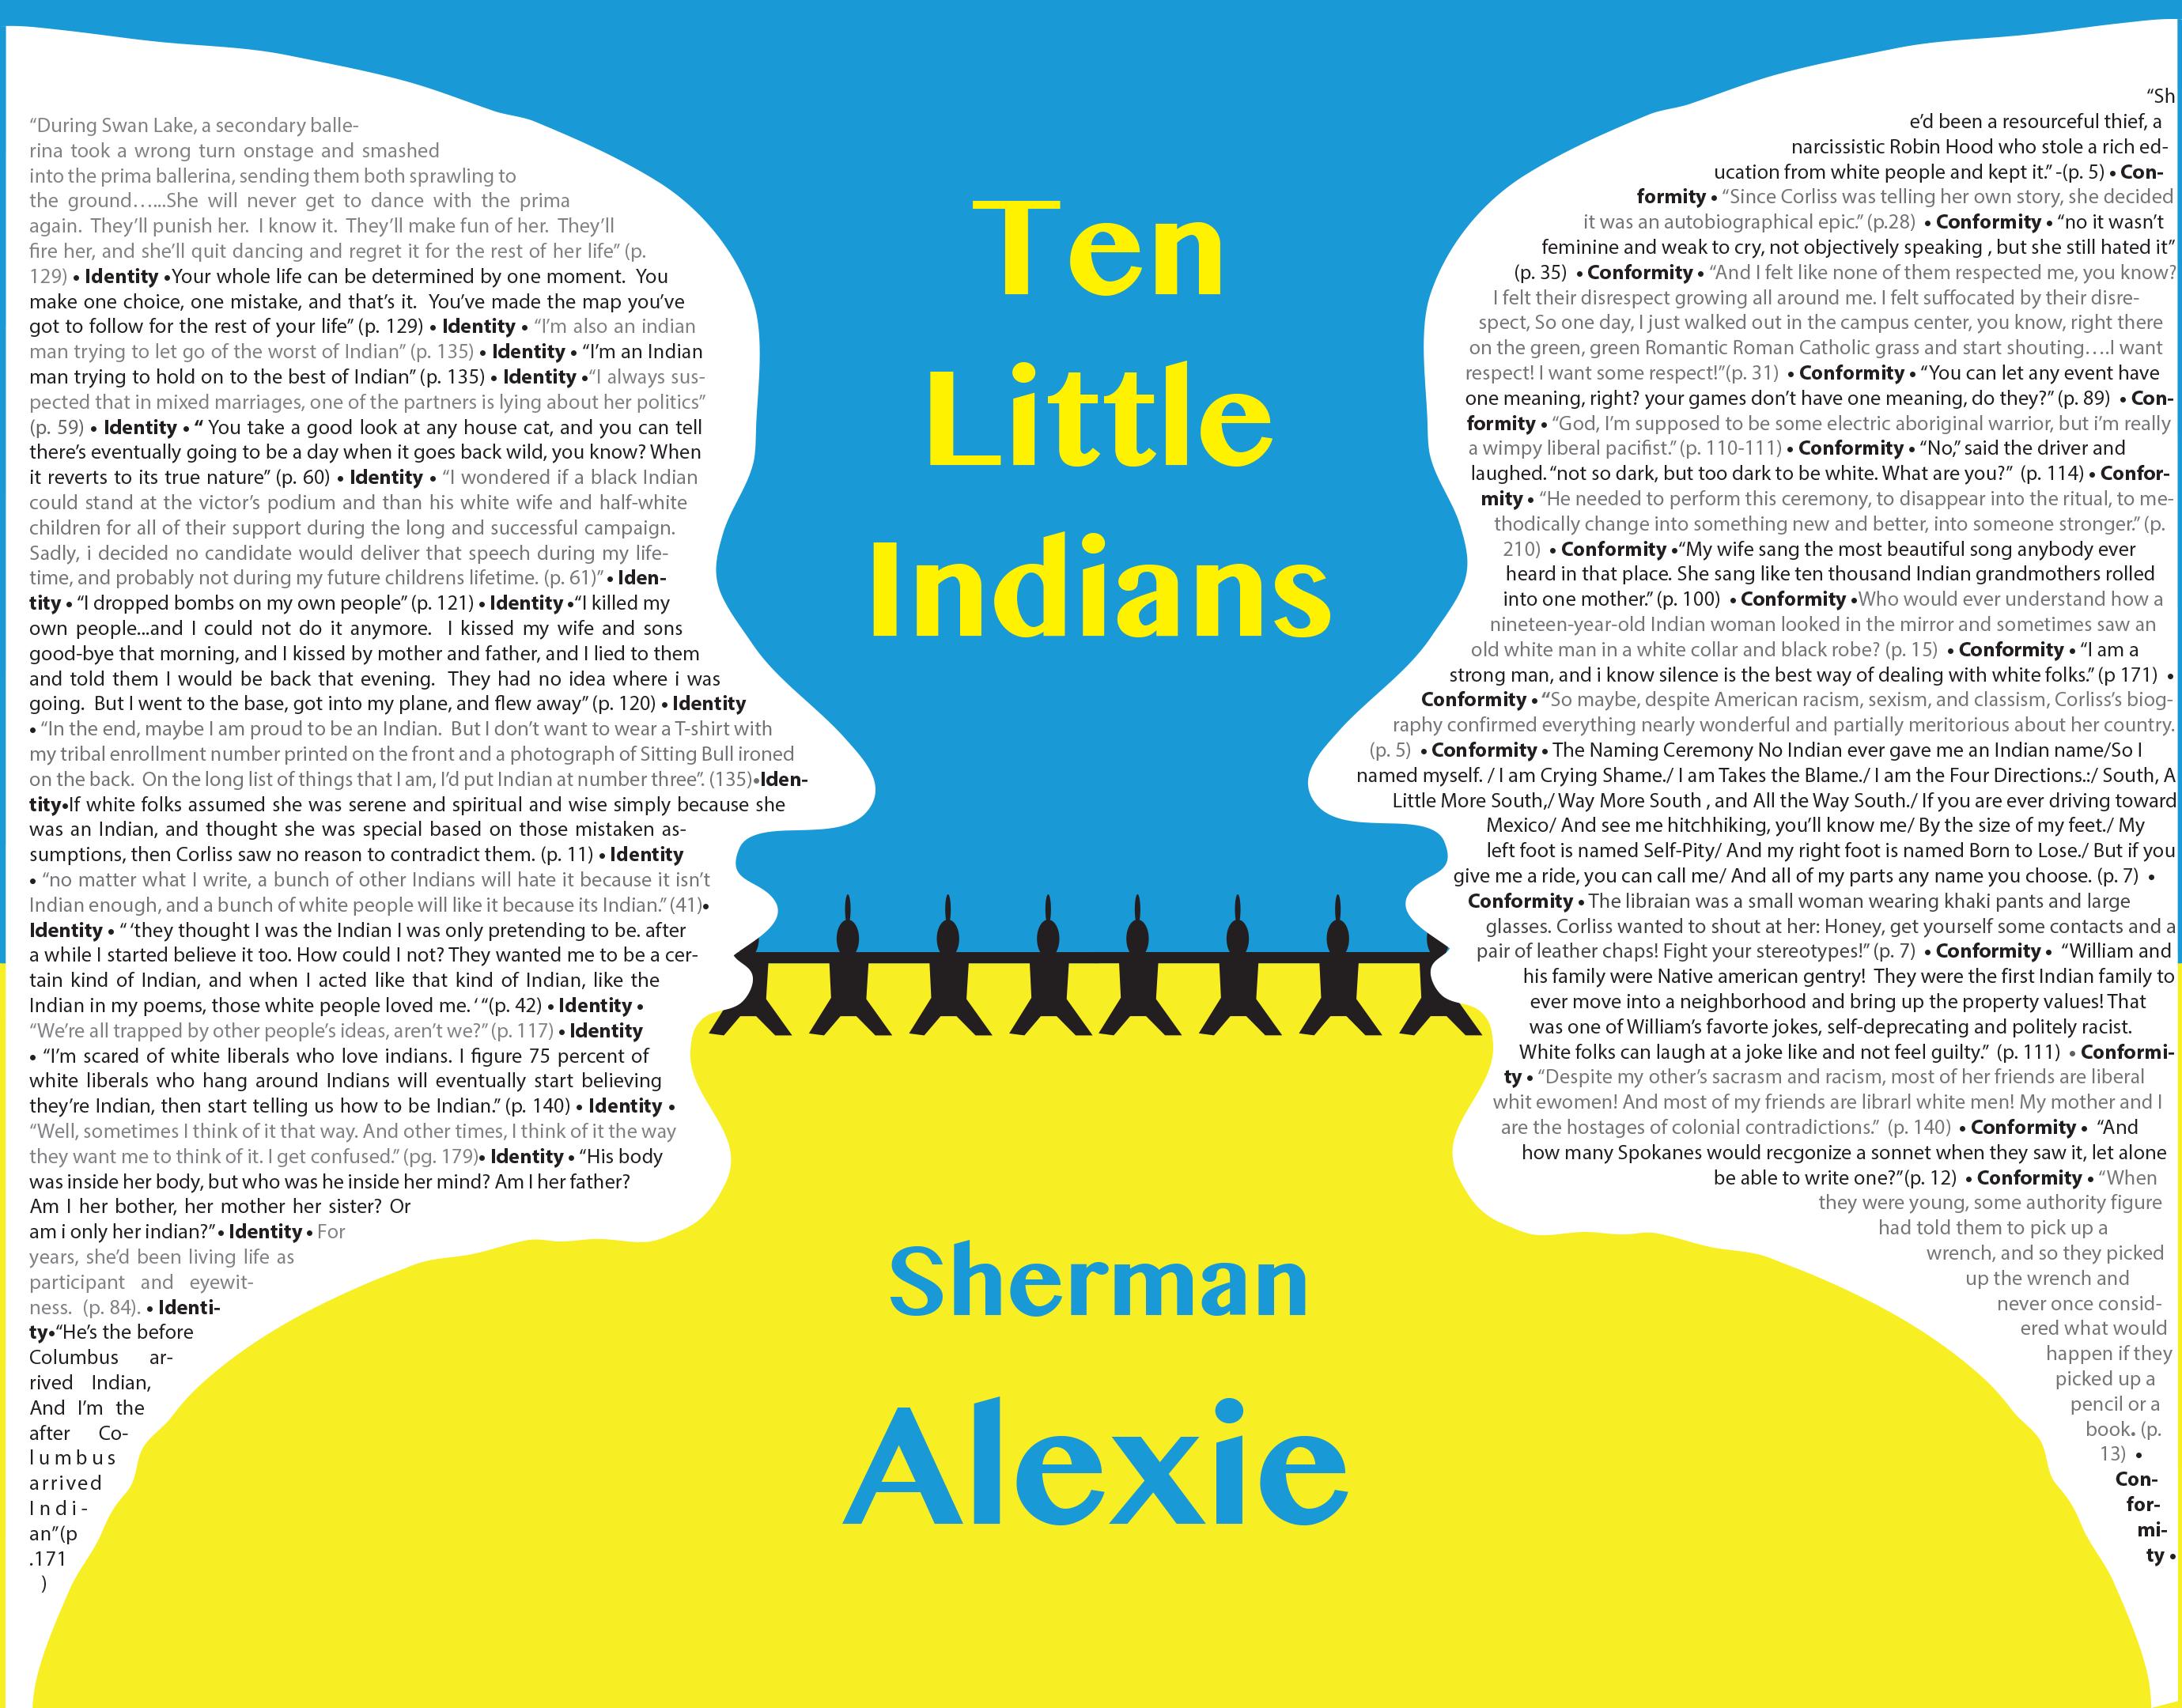 Ten Little Indians - Minhtuyen Mai